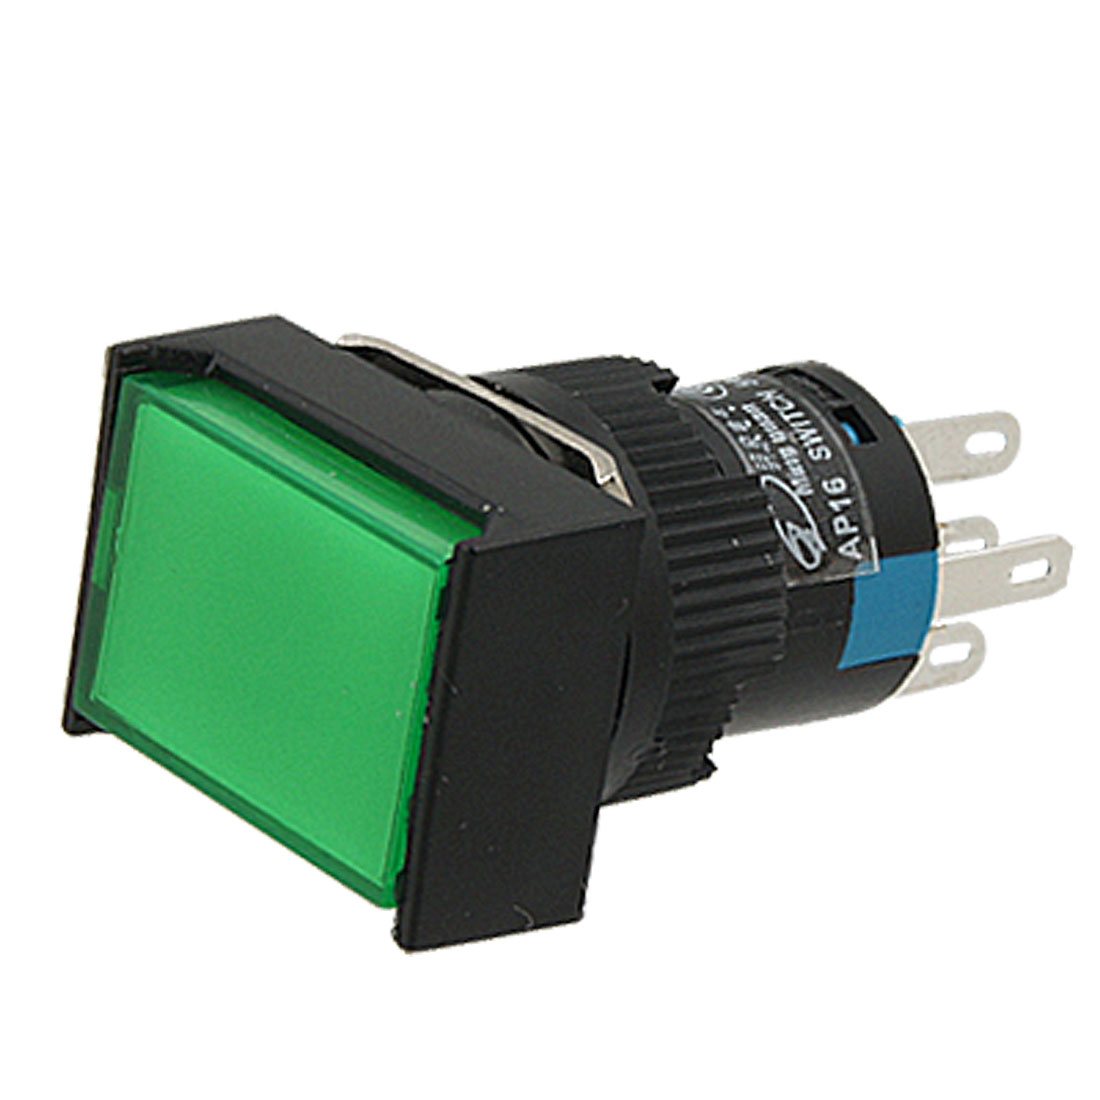 Self-locking Type Green Cap Push Button Switch w Lamp